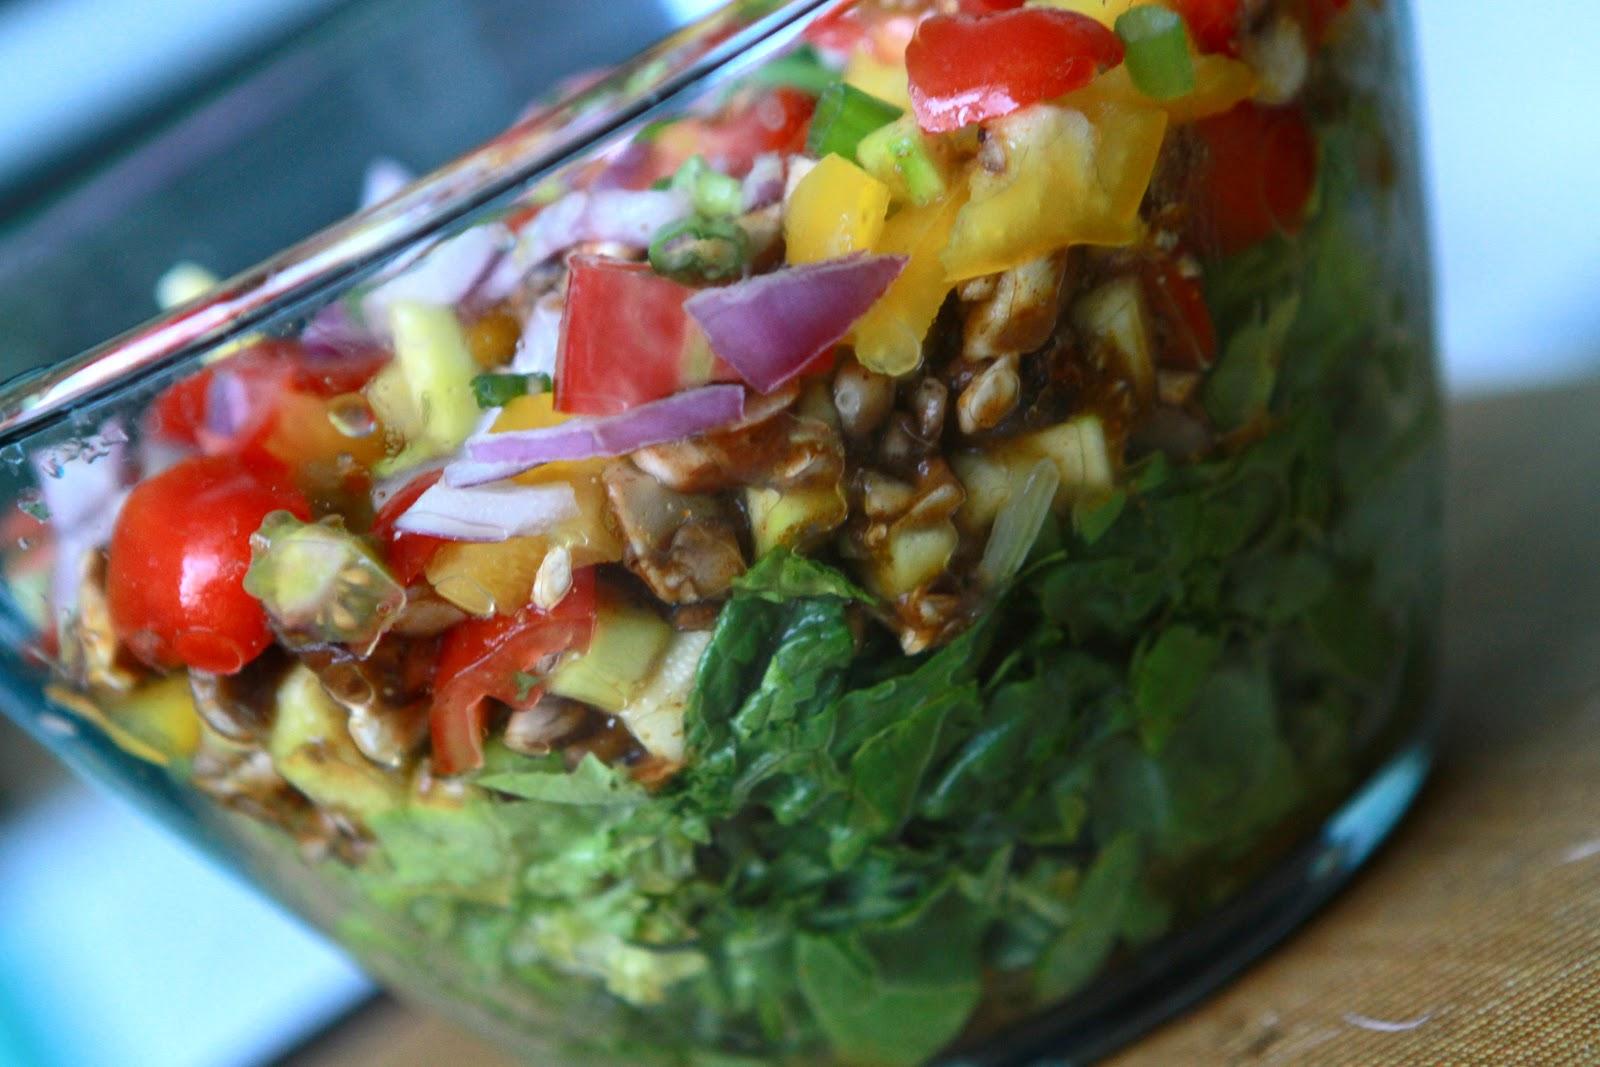 Taco Salad! (Low Fat, Raw Vegan- translation - Healthy!)